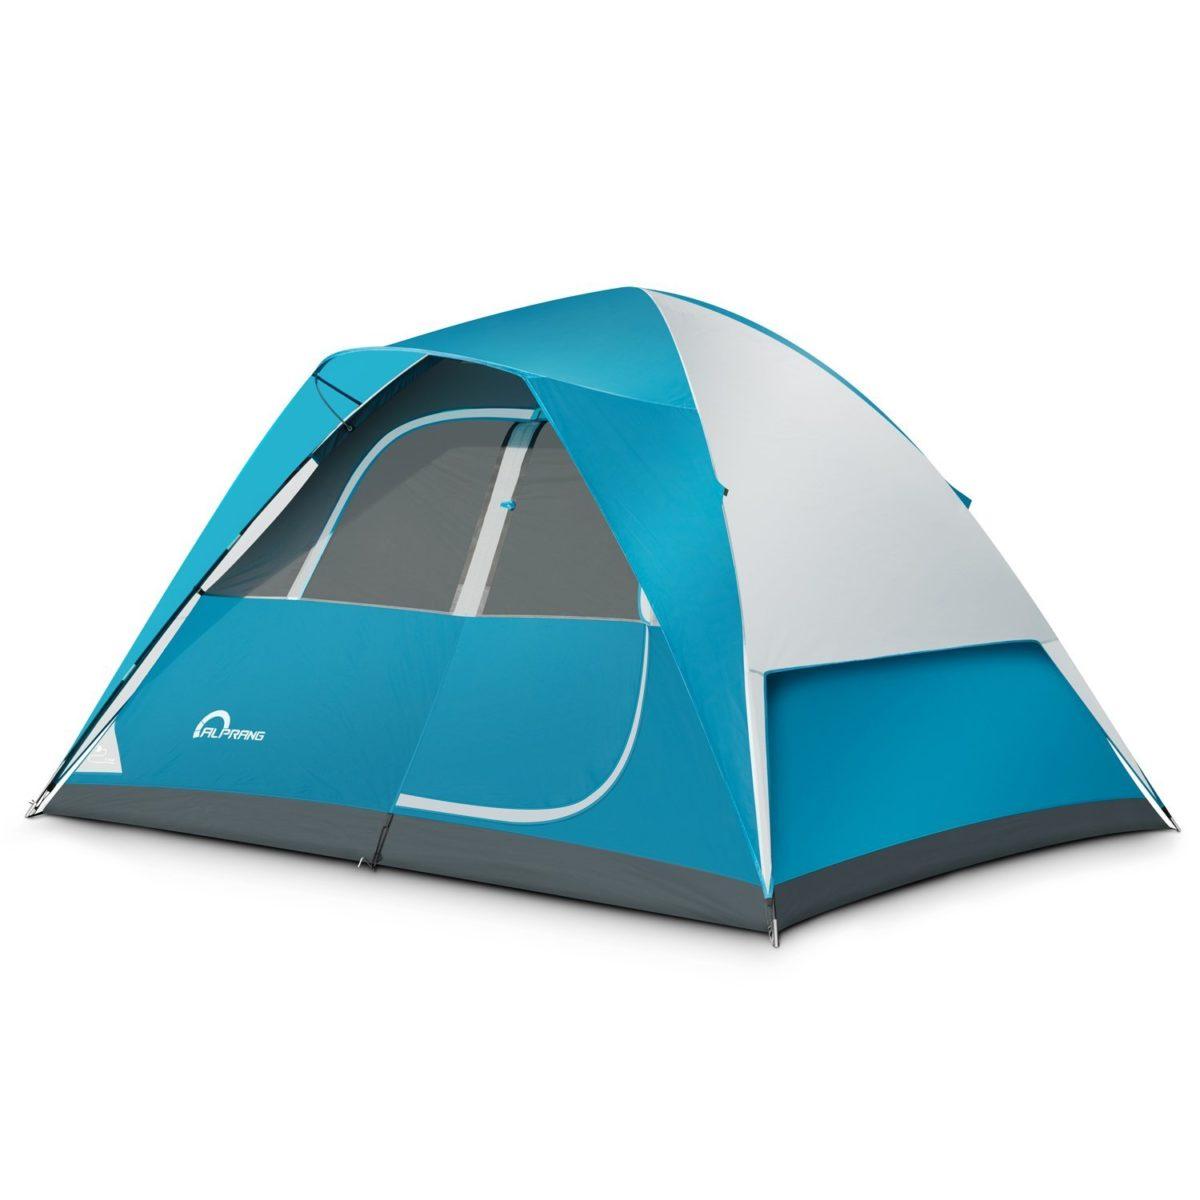 Alprang 6 Person Dome Camping Tent